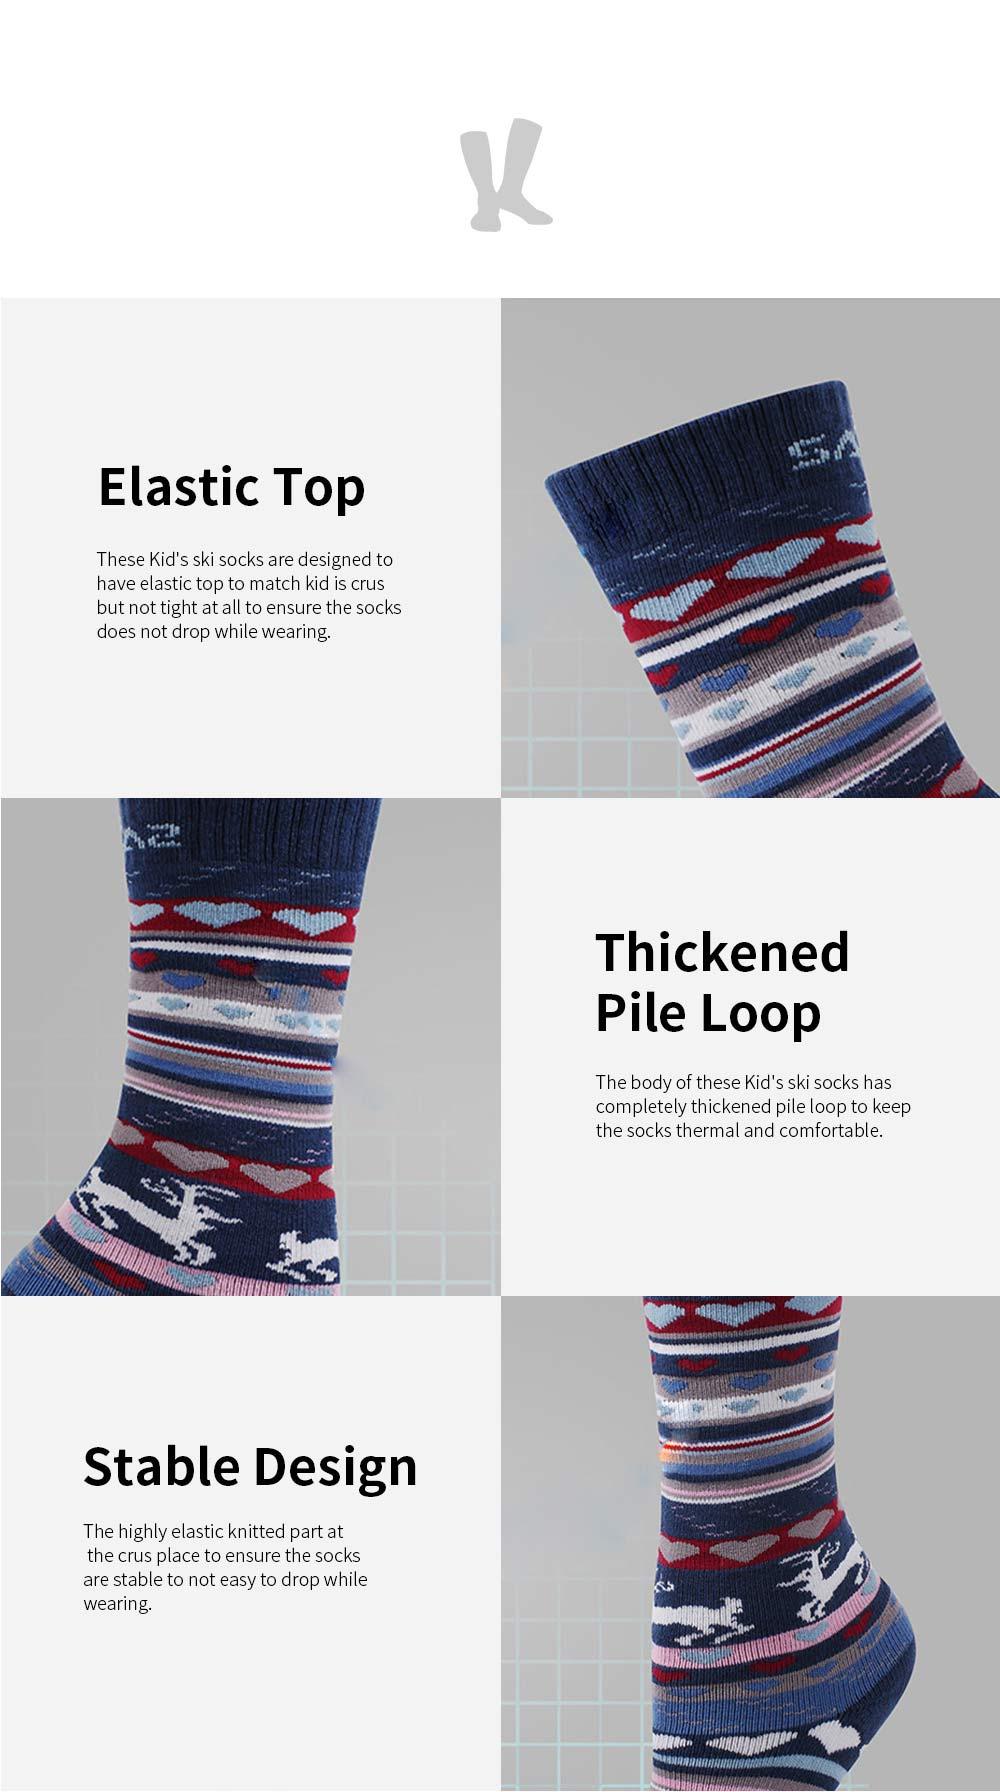 SANTO Ski Socks for Winter Outdoor Activities Thickened Cotton Socks Kids' Lightweight Thermal Socks Odor Resistant Socks 3